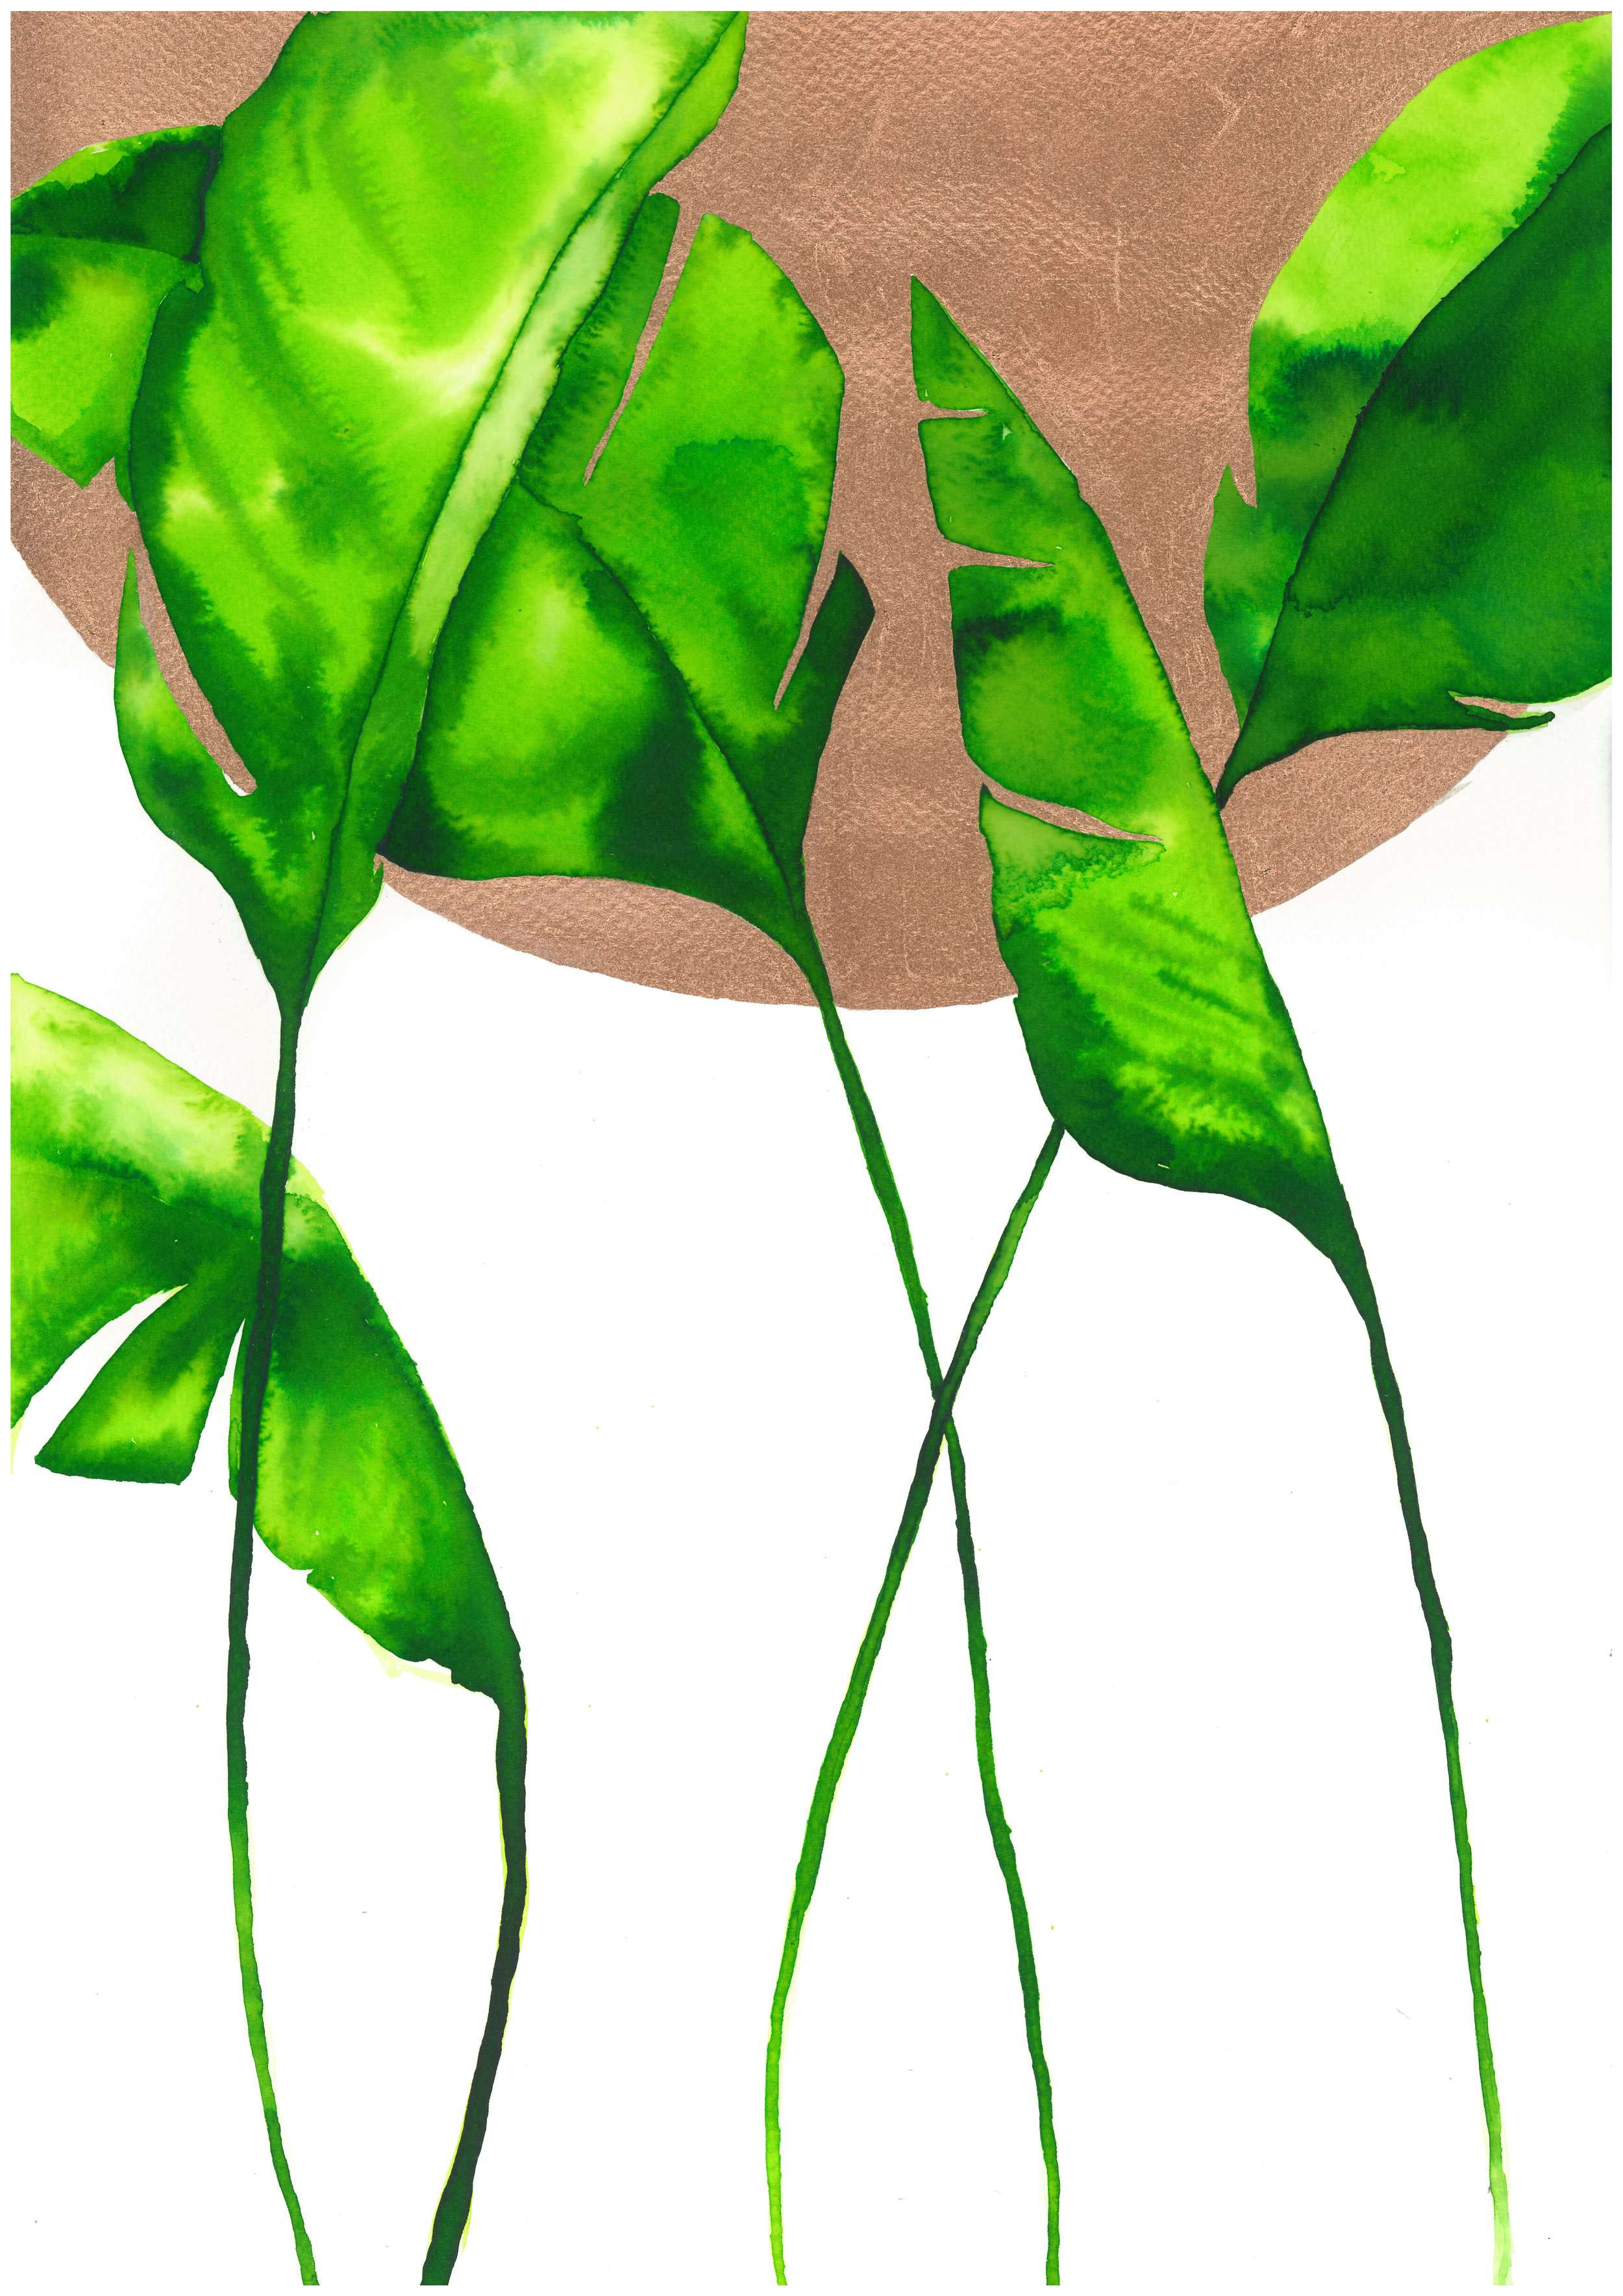 nadine-walker-illustration-blackgold-bronze-leaves.jpg